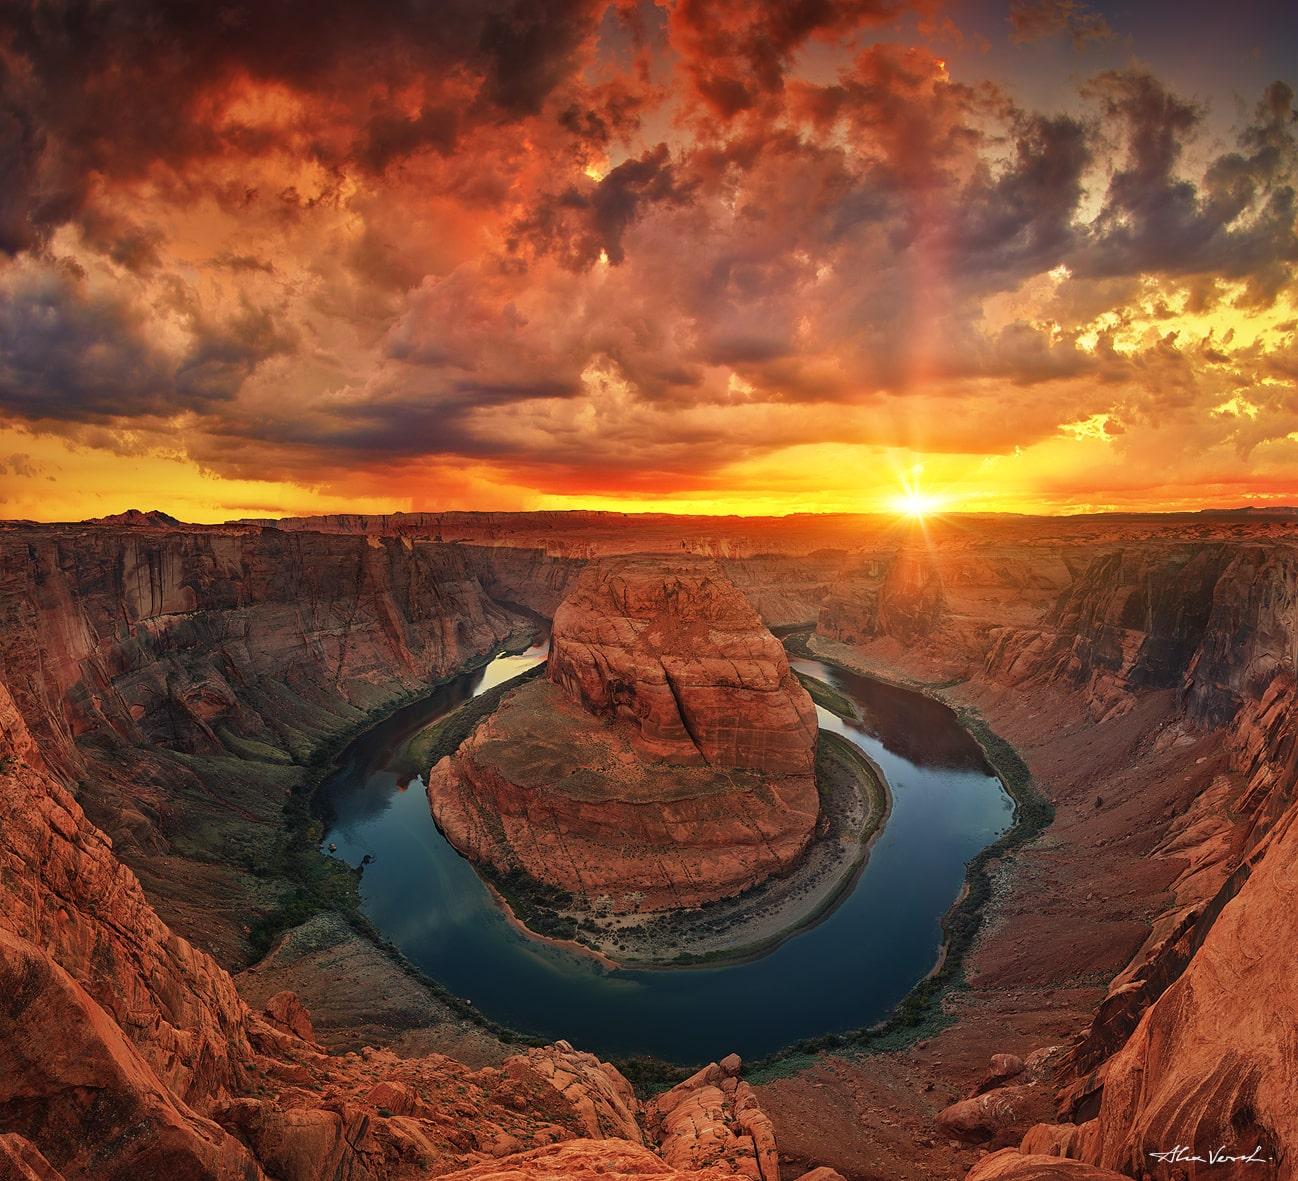 Horseshoe Bend Photo, Colorado River Bend, American Southwest Photography, Arizona Photography, Alexander Vershinin, photo